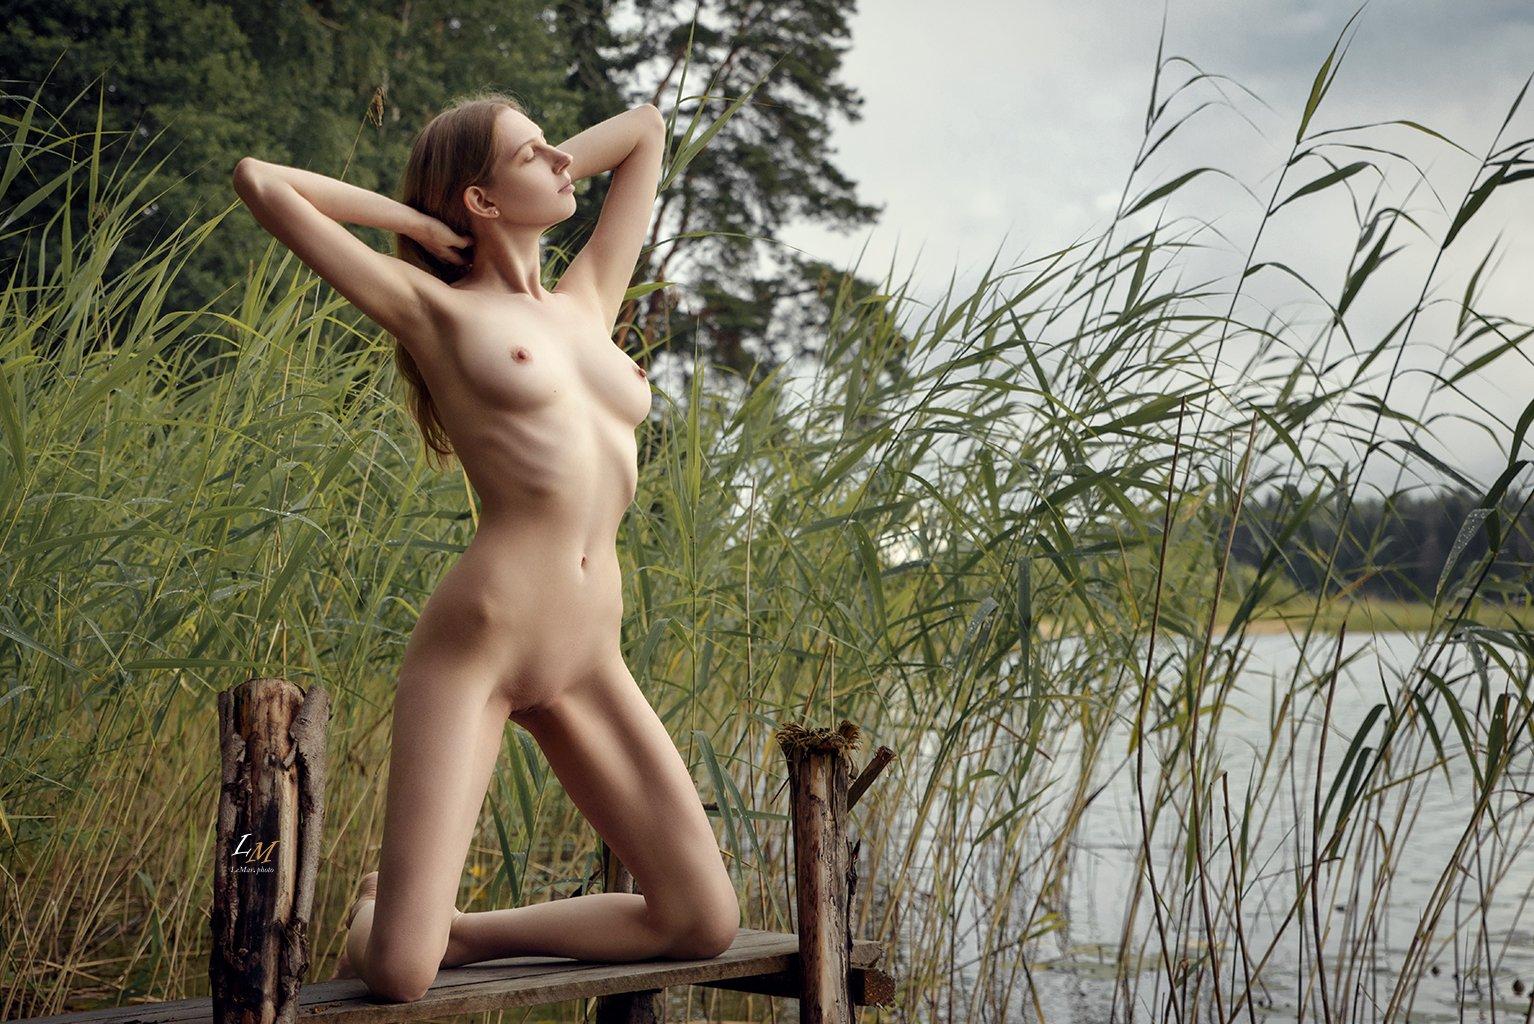 ню, арт, артню, девушка, озеро, природа, фотограф, нюфотограф, артфотограф, Маркачев Леонид